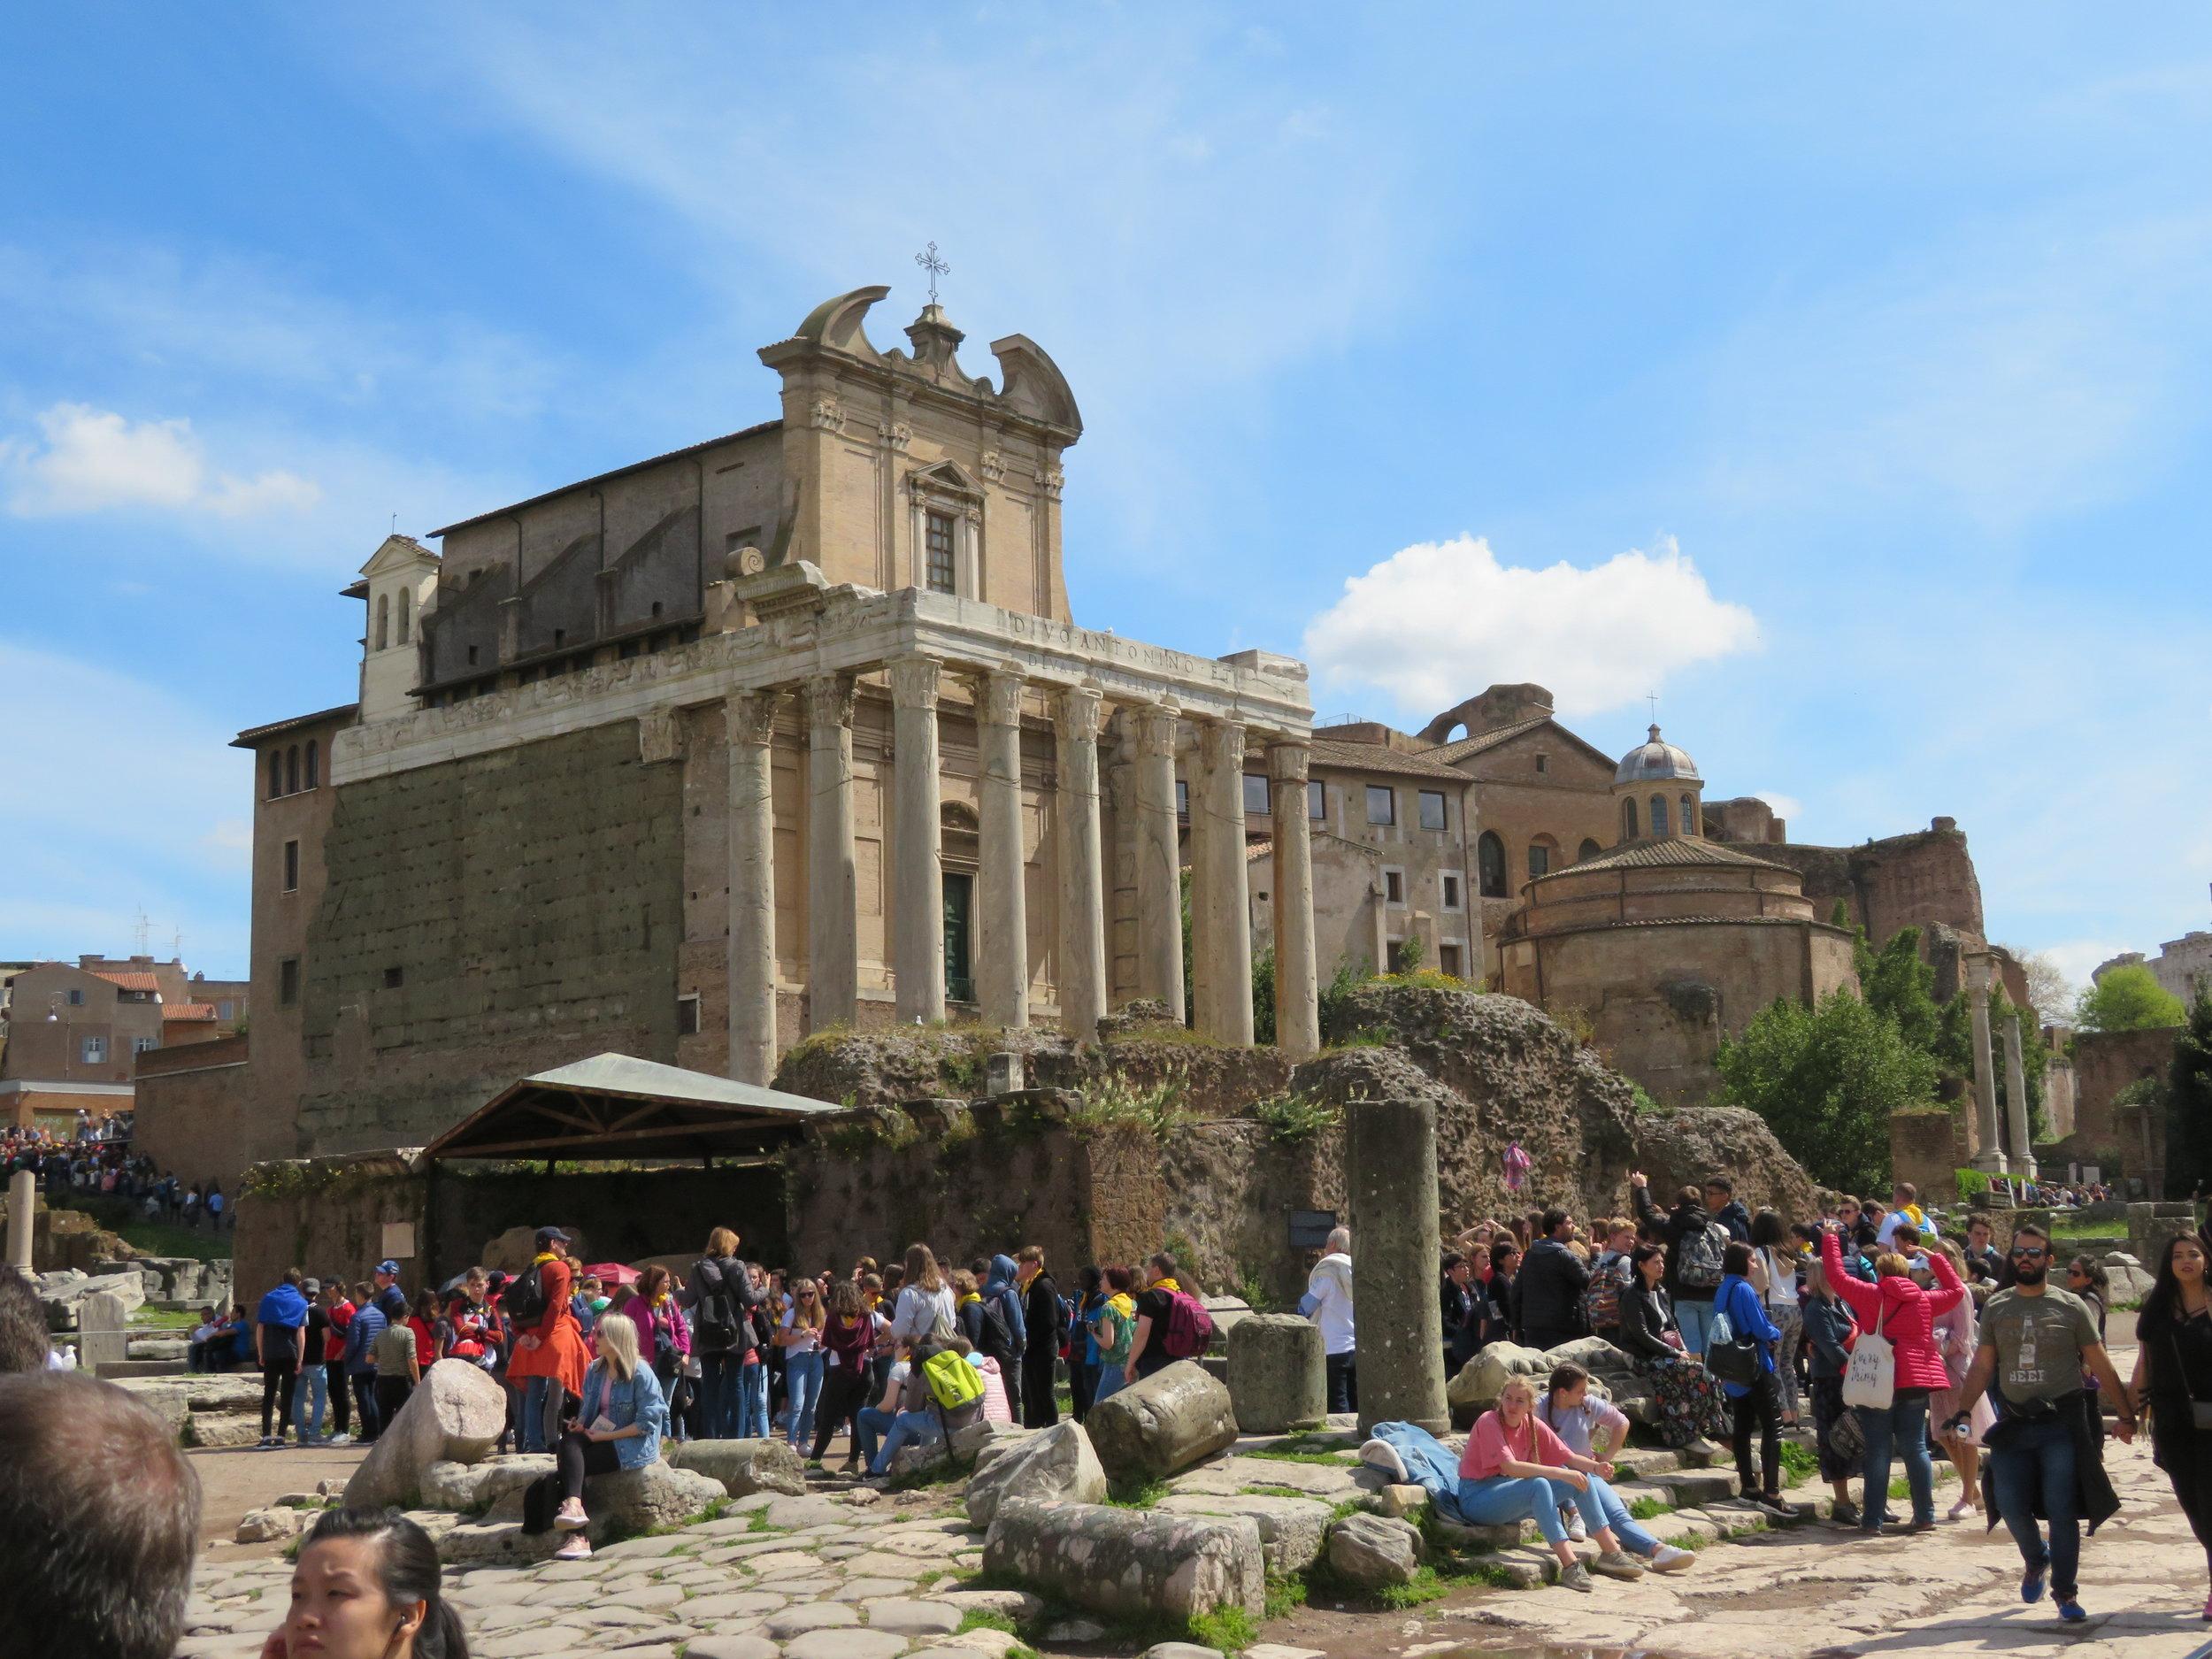 Colosseum_forum ruins1.JPG